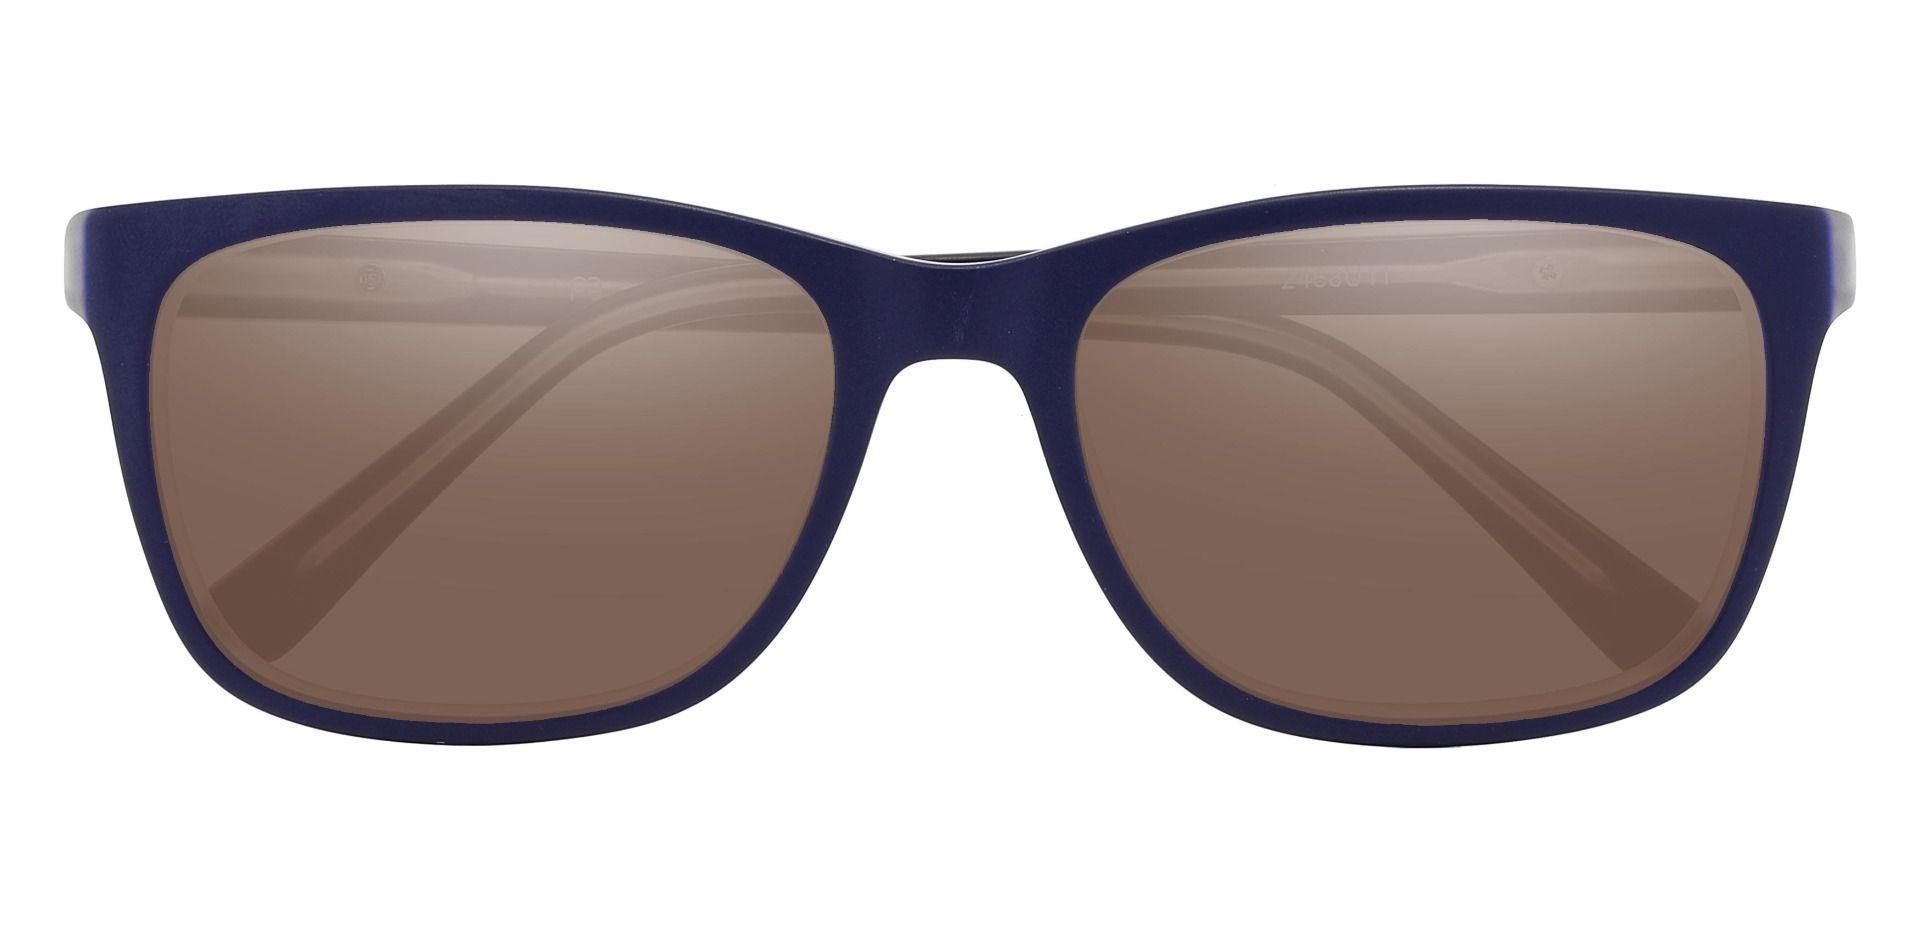 Lodge Rectangle Prescription Sunglasses - Blue Frame With Brown Lenses